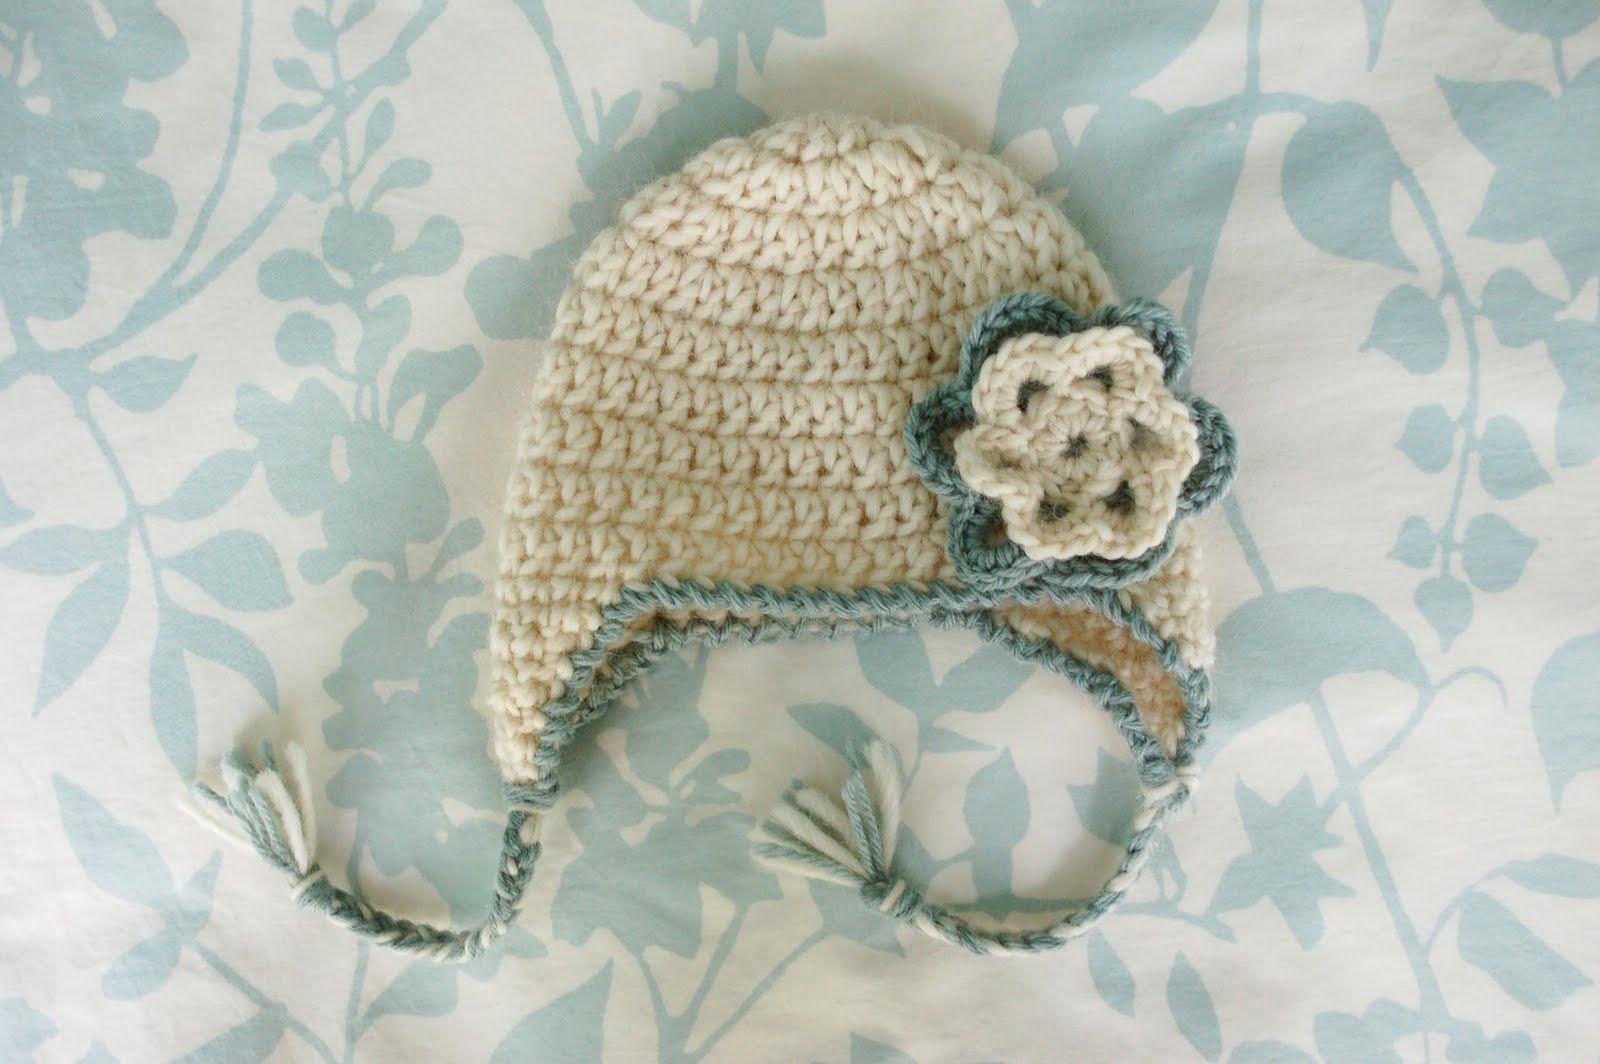 Alli Crafts: Free Pattern: Baby Earflap Hat - Newborn | Free Crochet ...